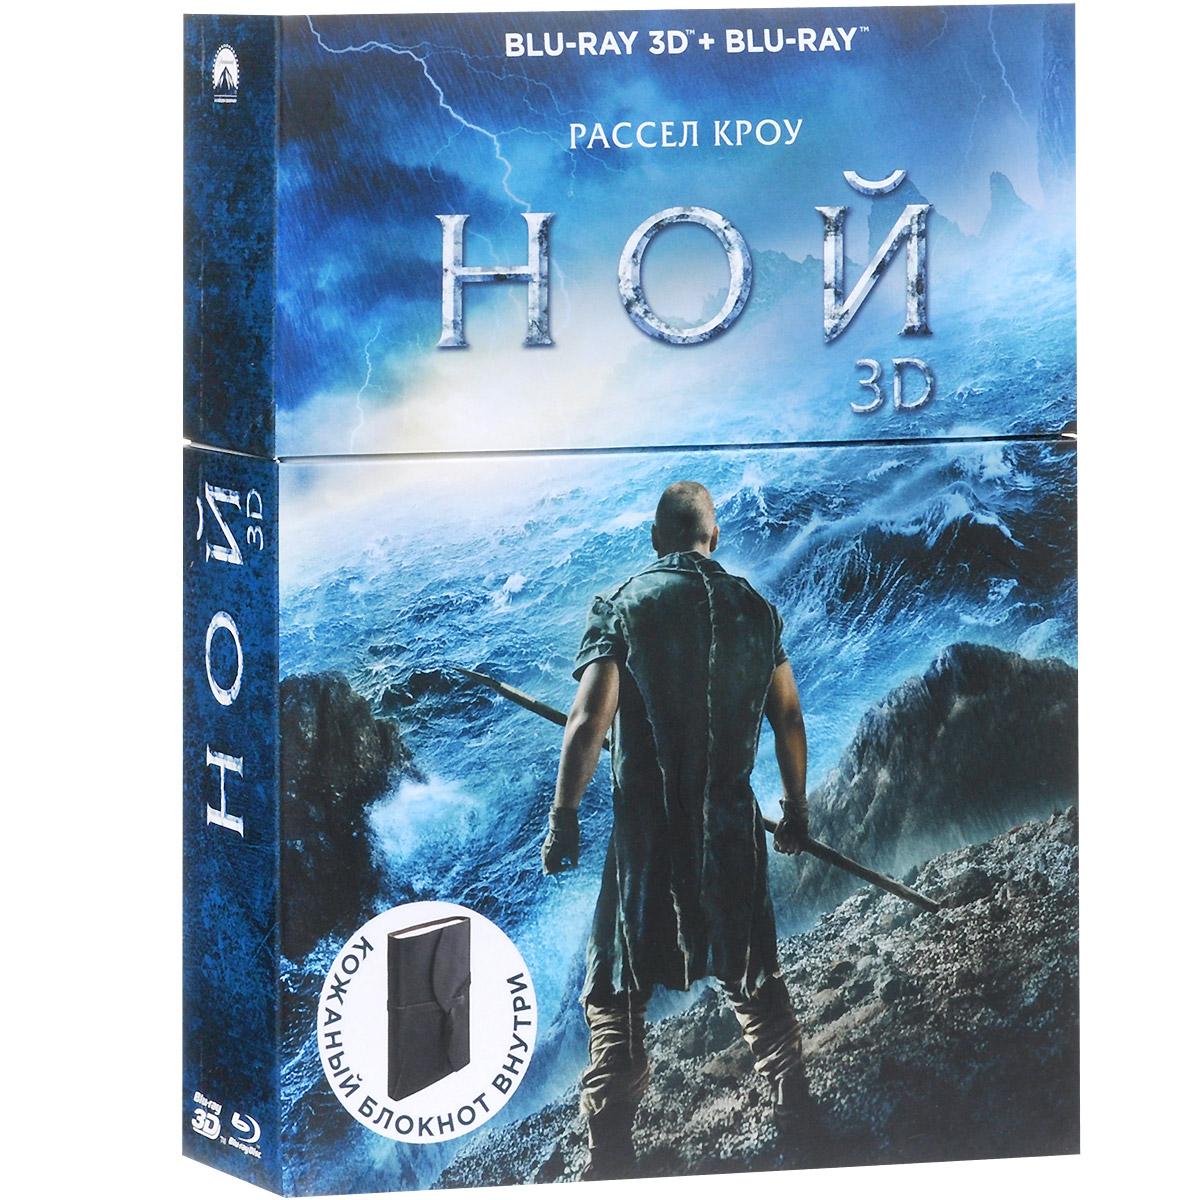 Ной 3D + 2D (2 Blu-ray) + Подарок: блокнот fox searchlight pictures protozoa pictures